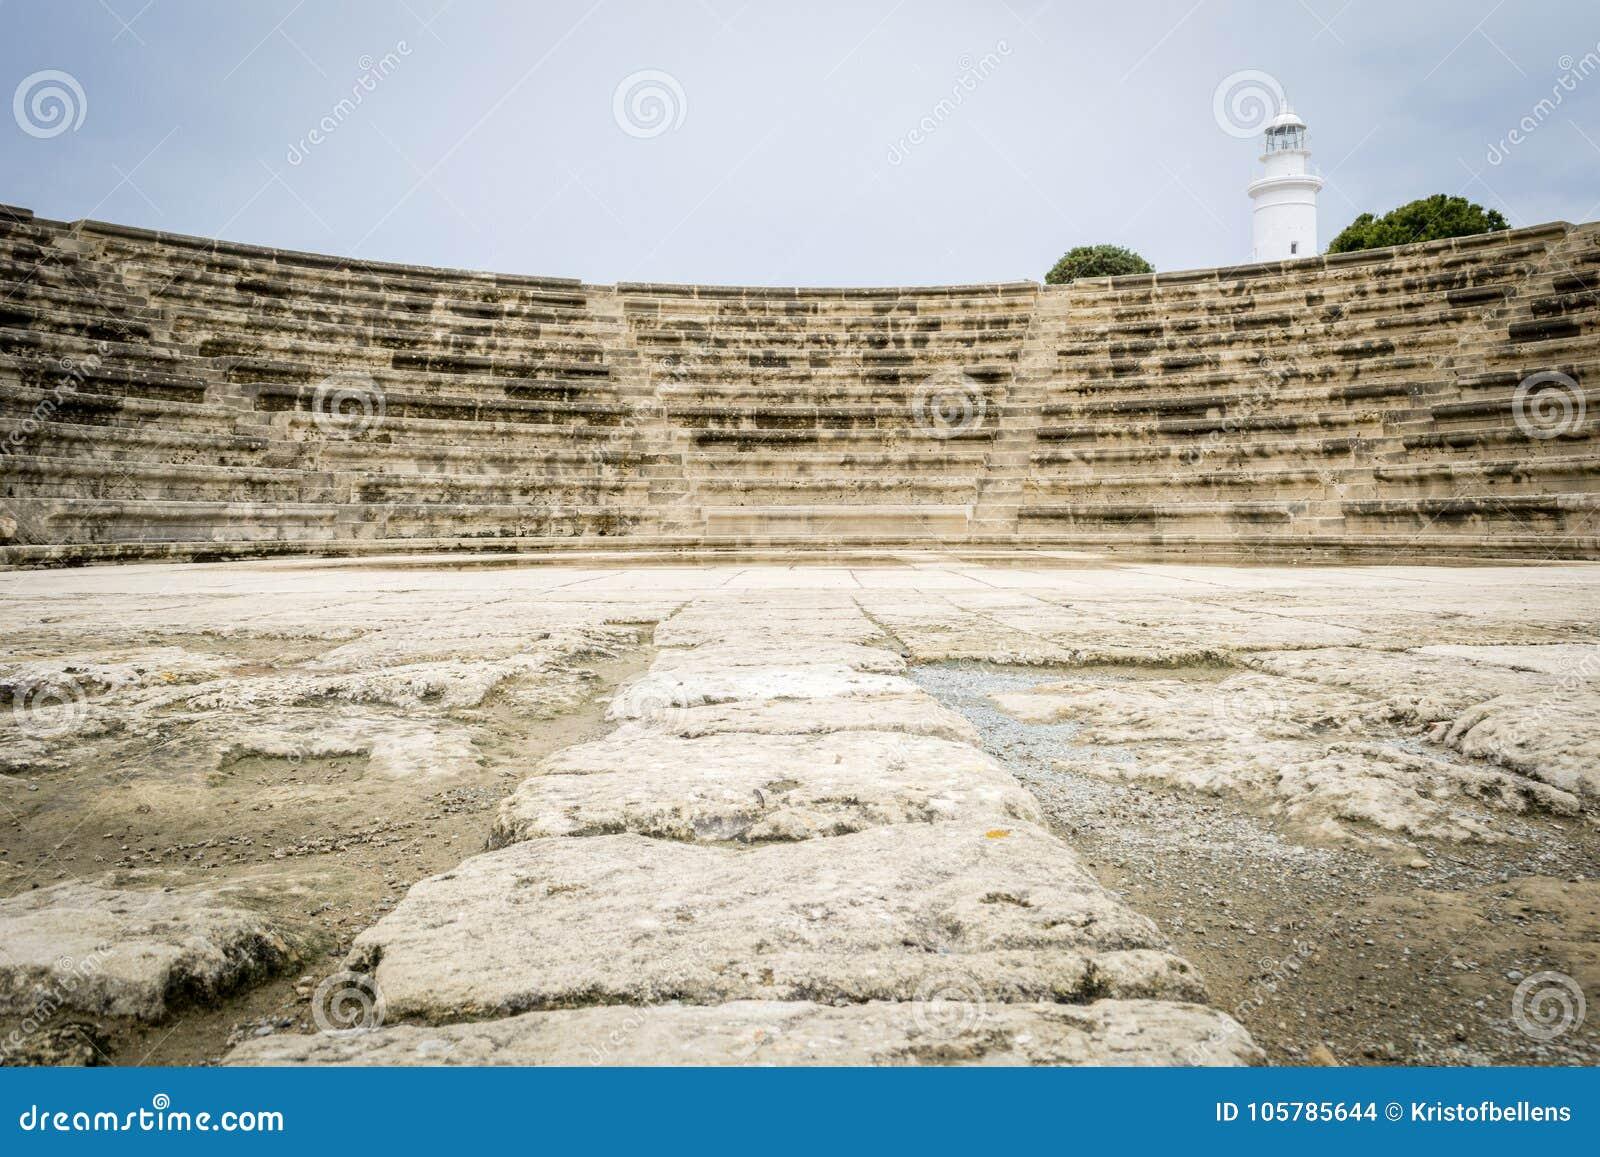 Roman theater Pafos Odeon, Cyprus